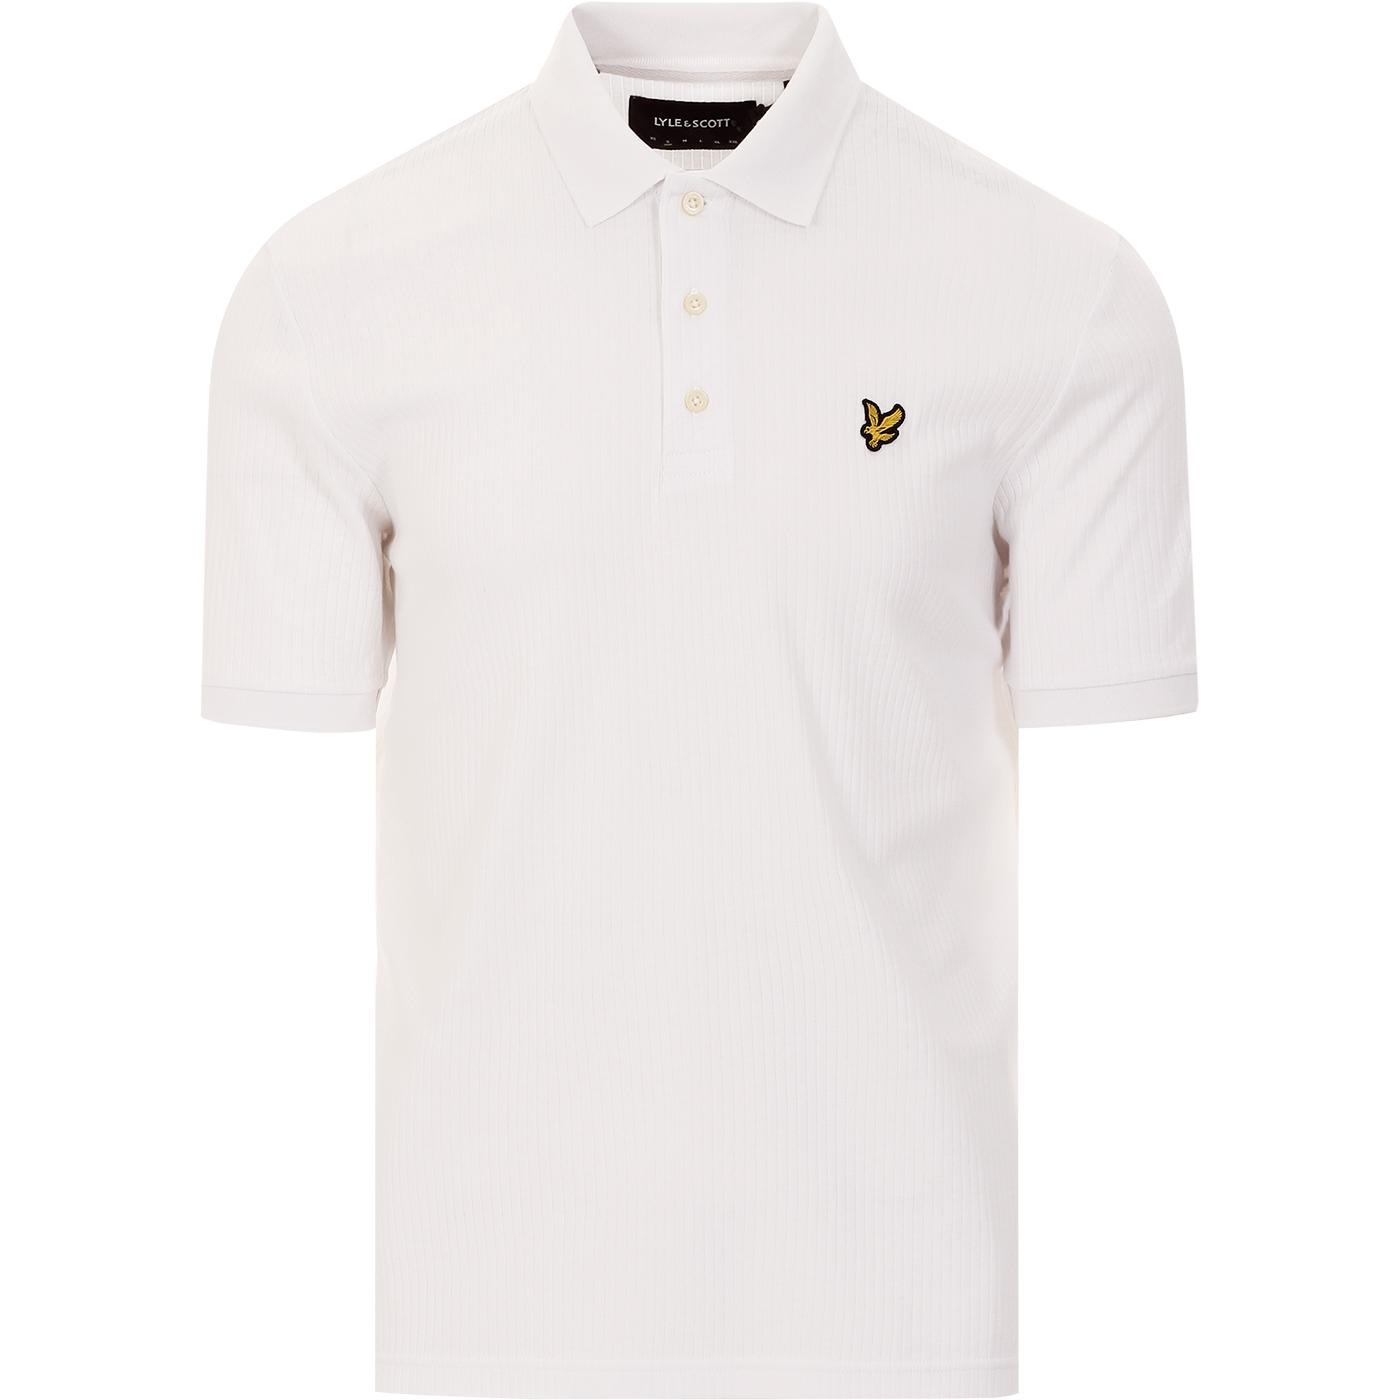 LYLE & SCOTT Retro Mod Ribbed Jersey Polo (White)